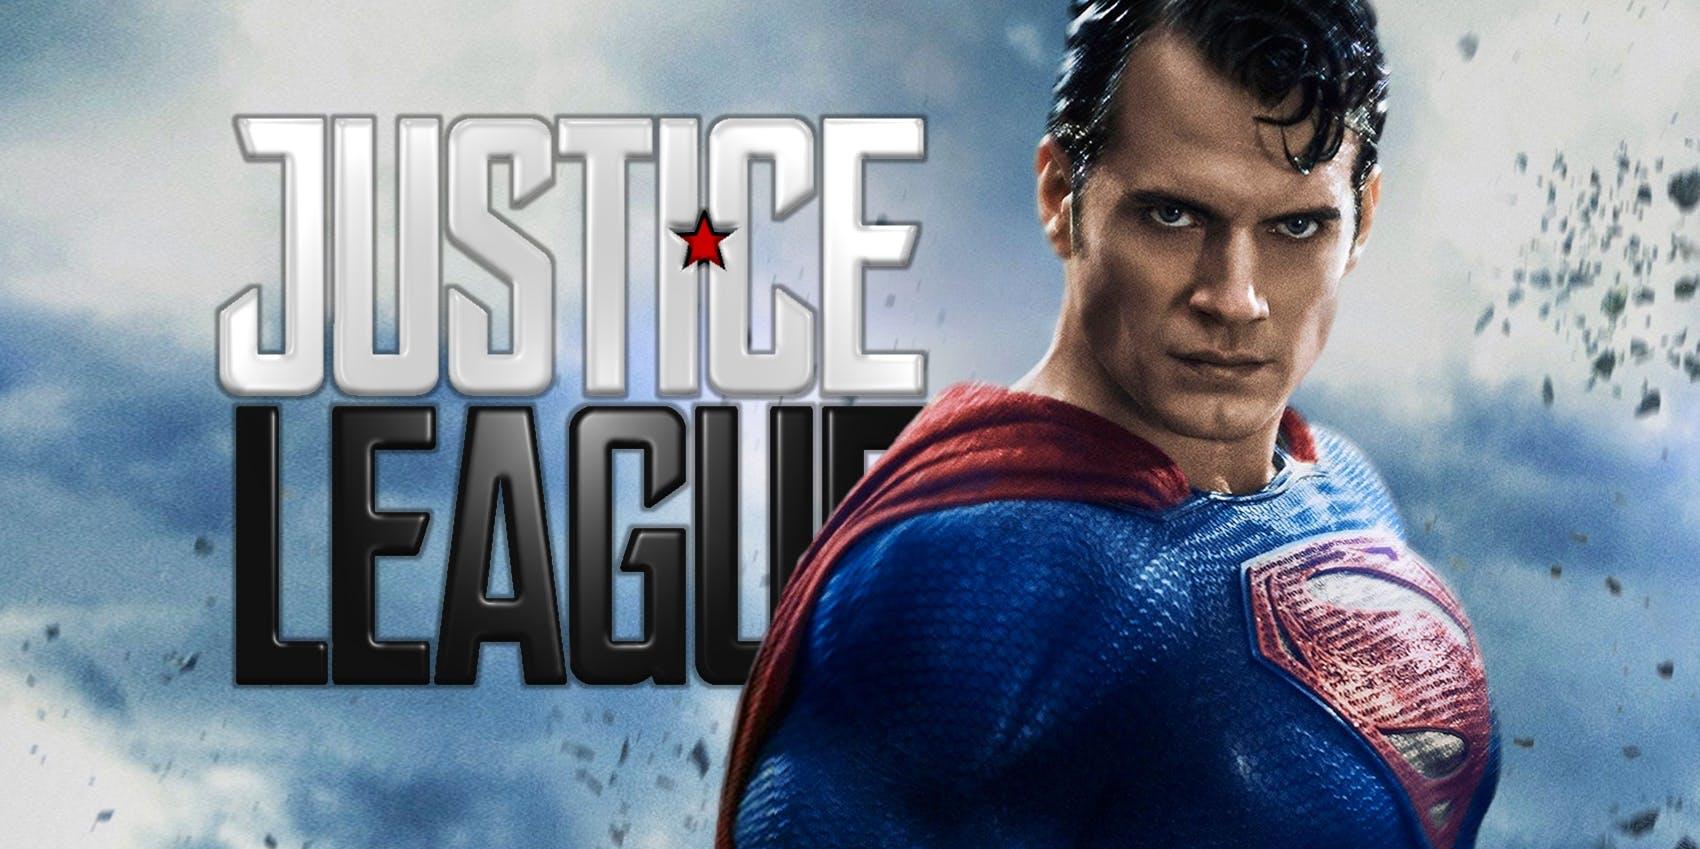 superman-justice-league-movie.jpg (163. Kb)